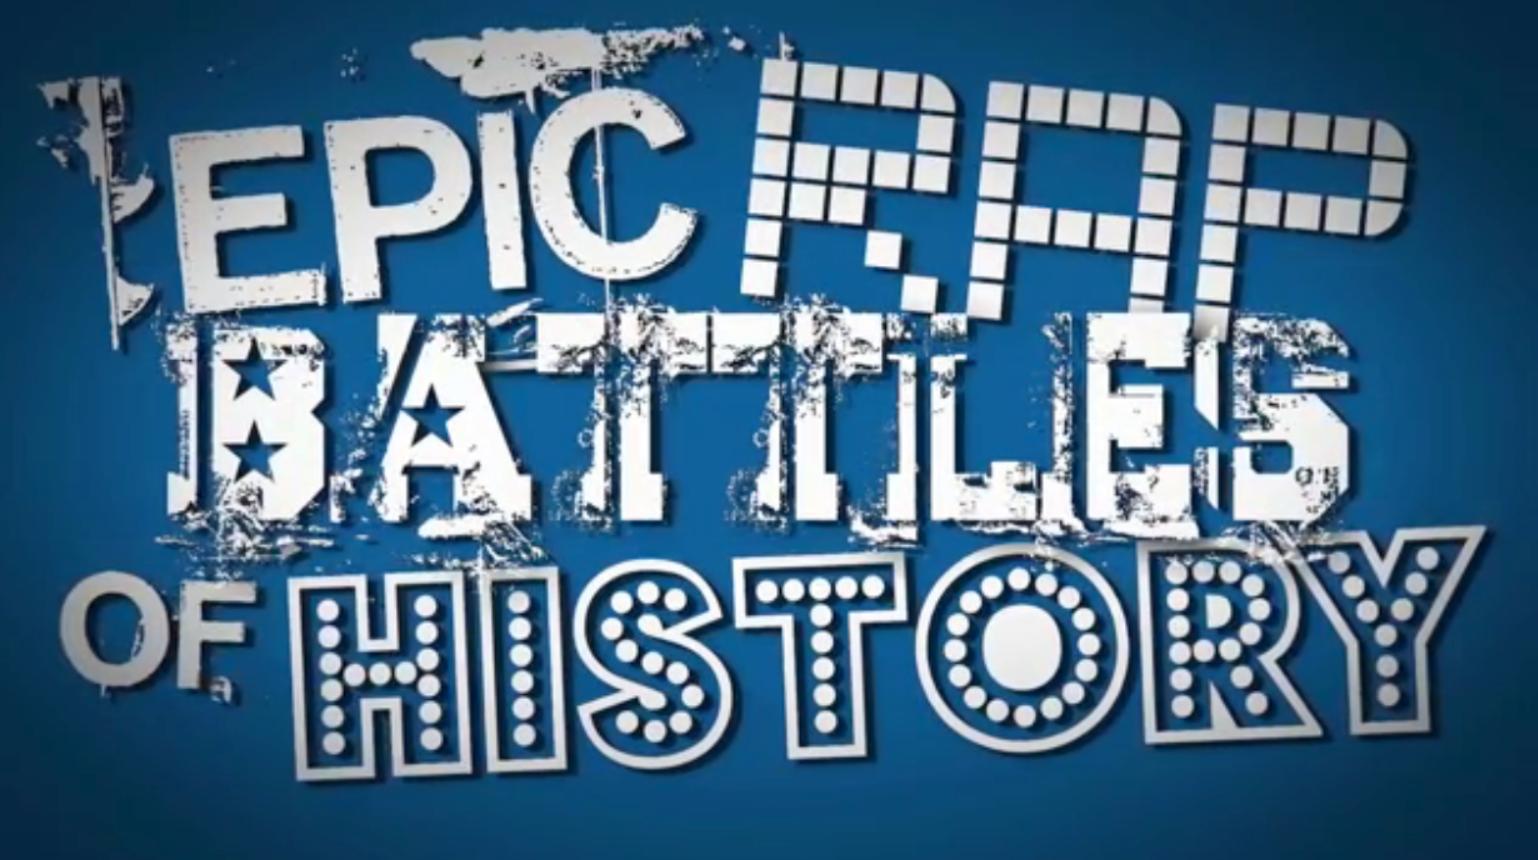 Epic rap battles of history Wallpaper and Hintergrund